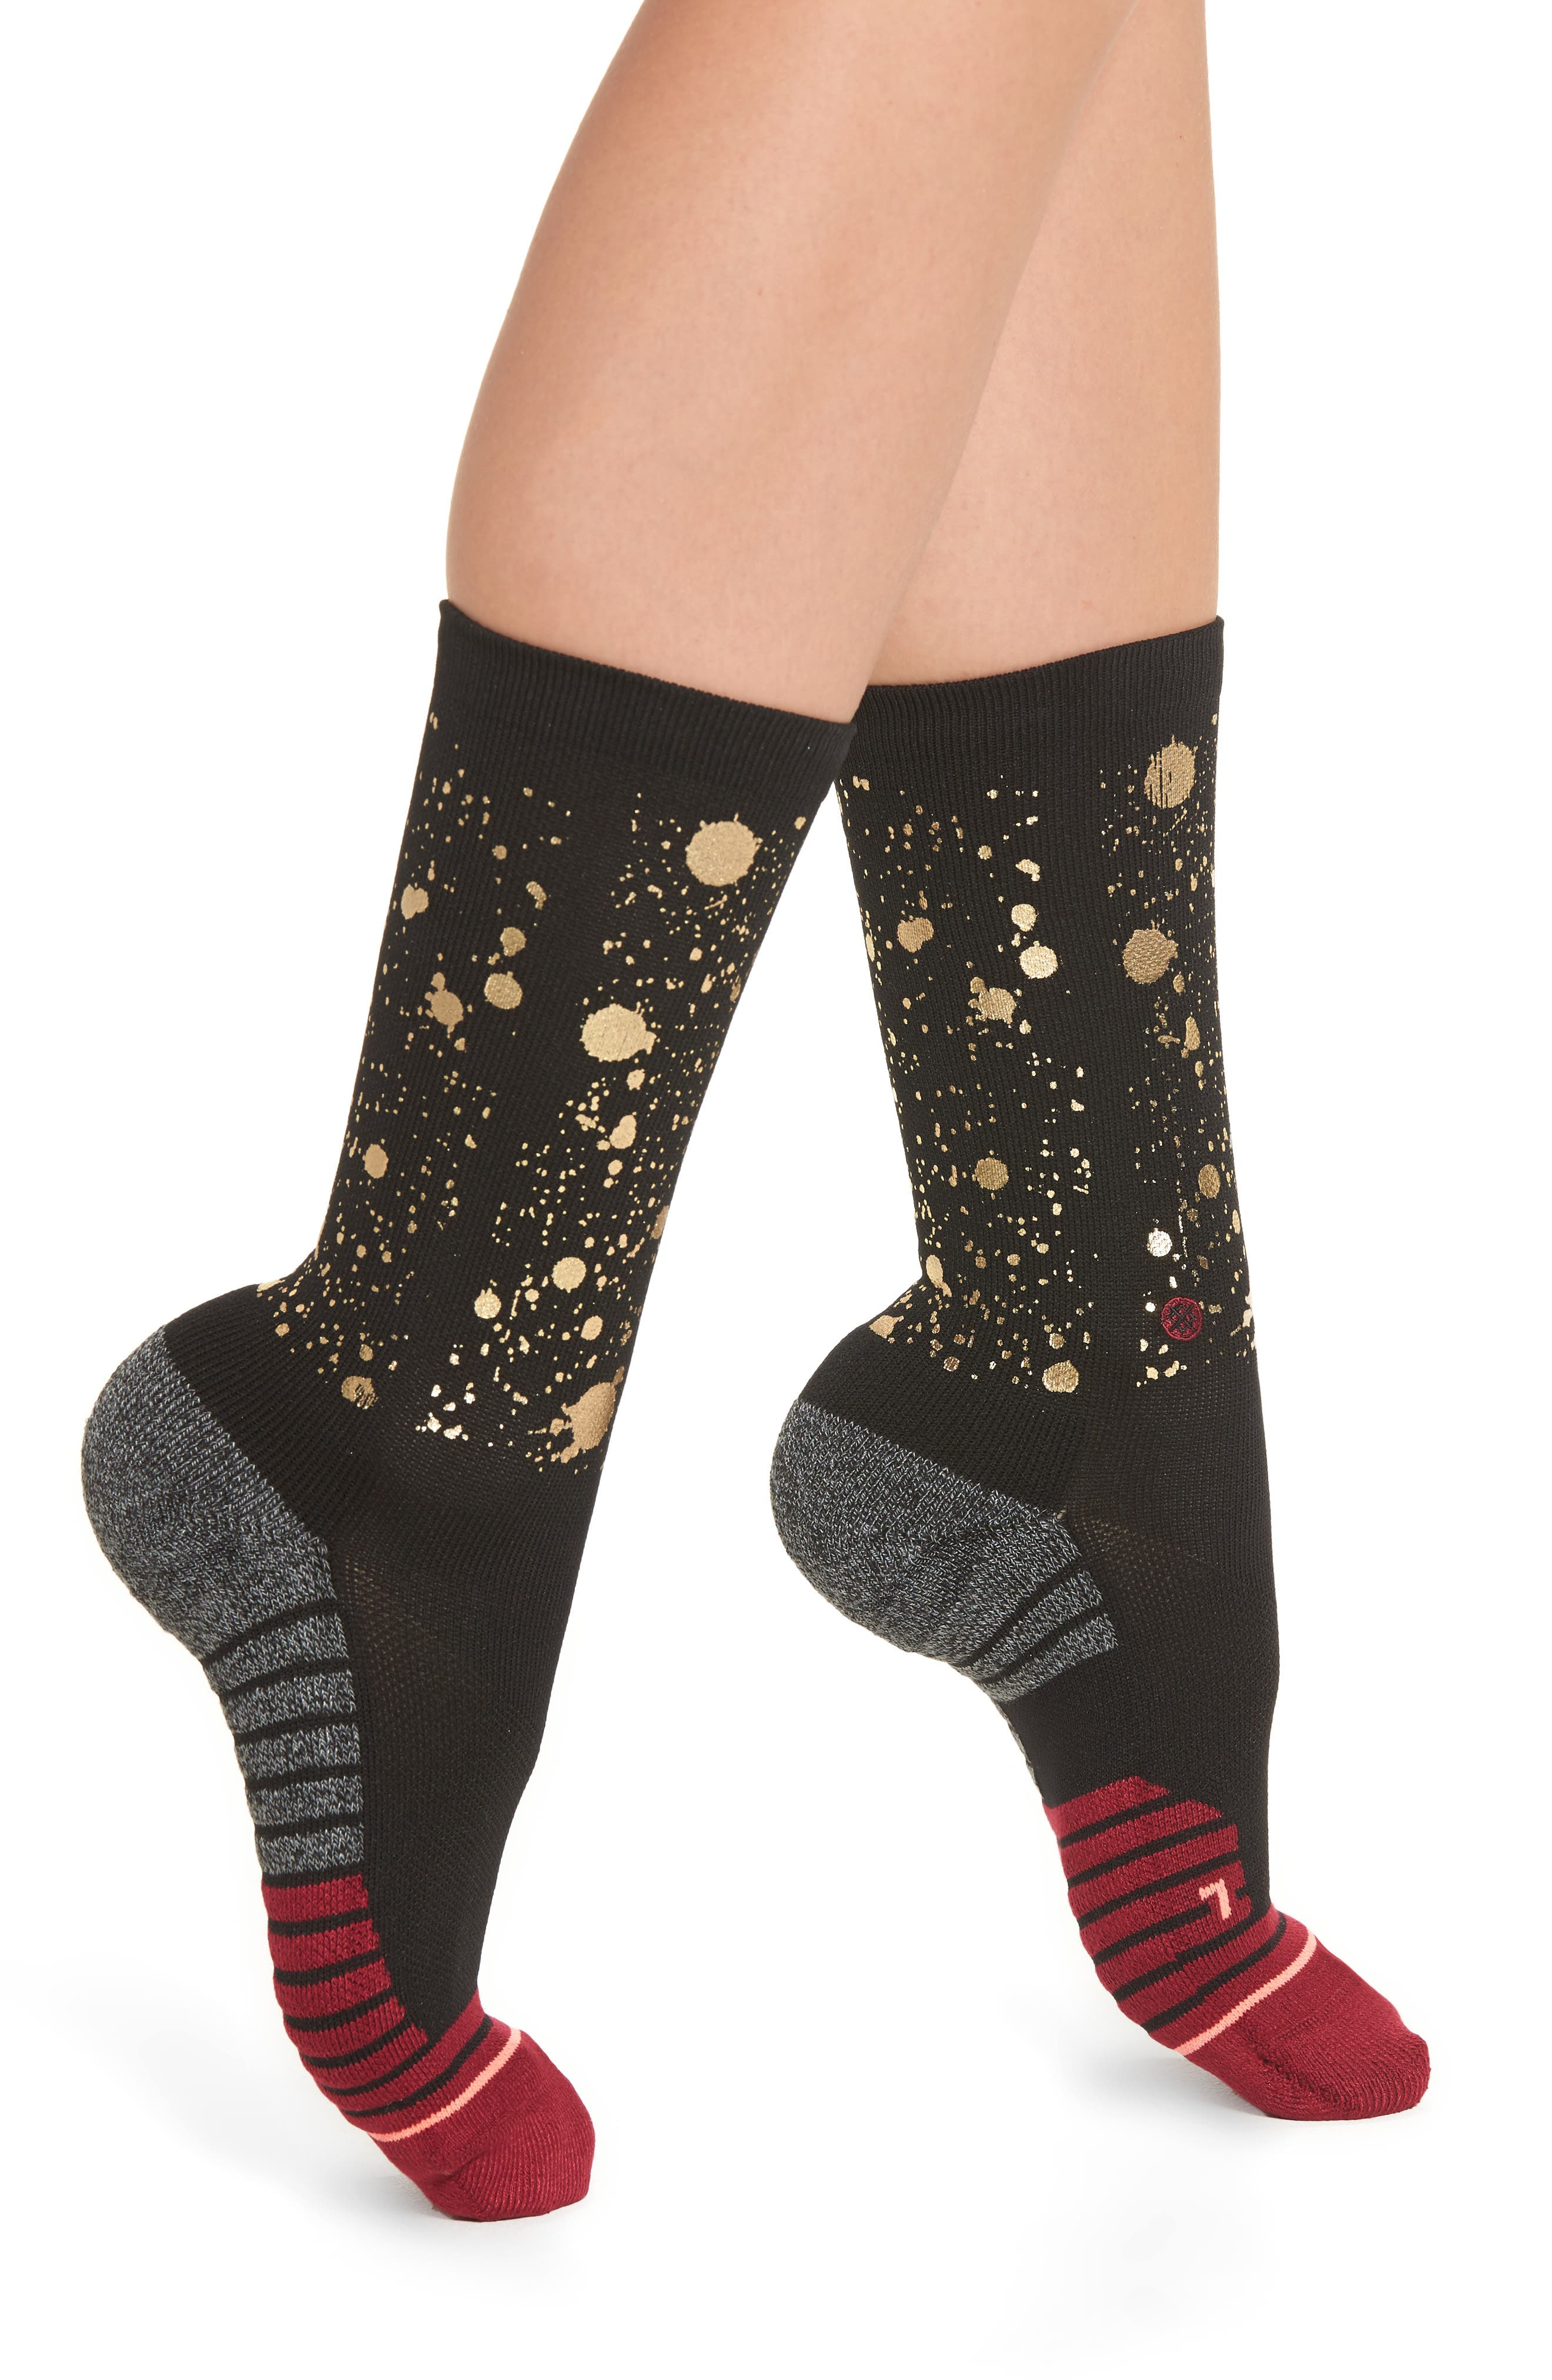 Endorphin Training Socks,                         Main,                         color,